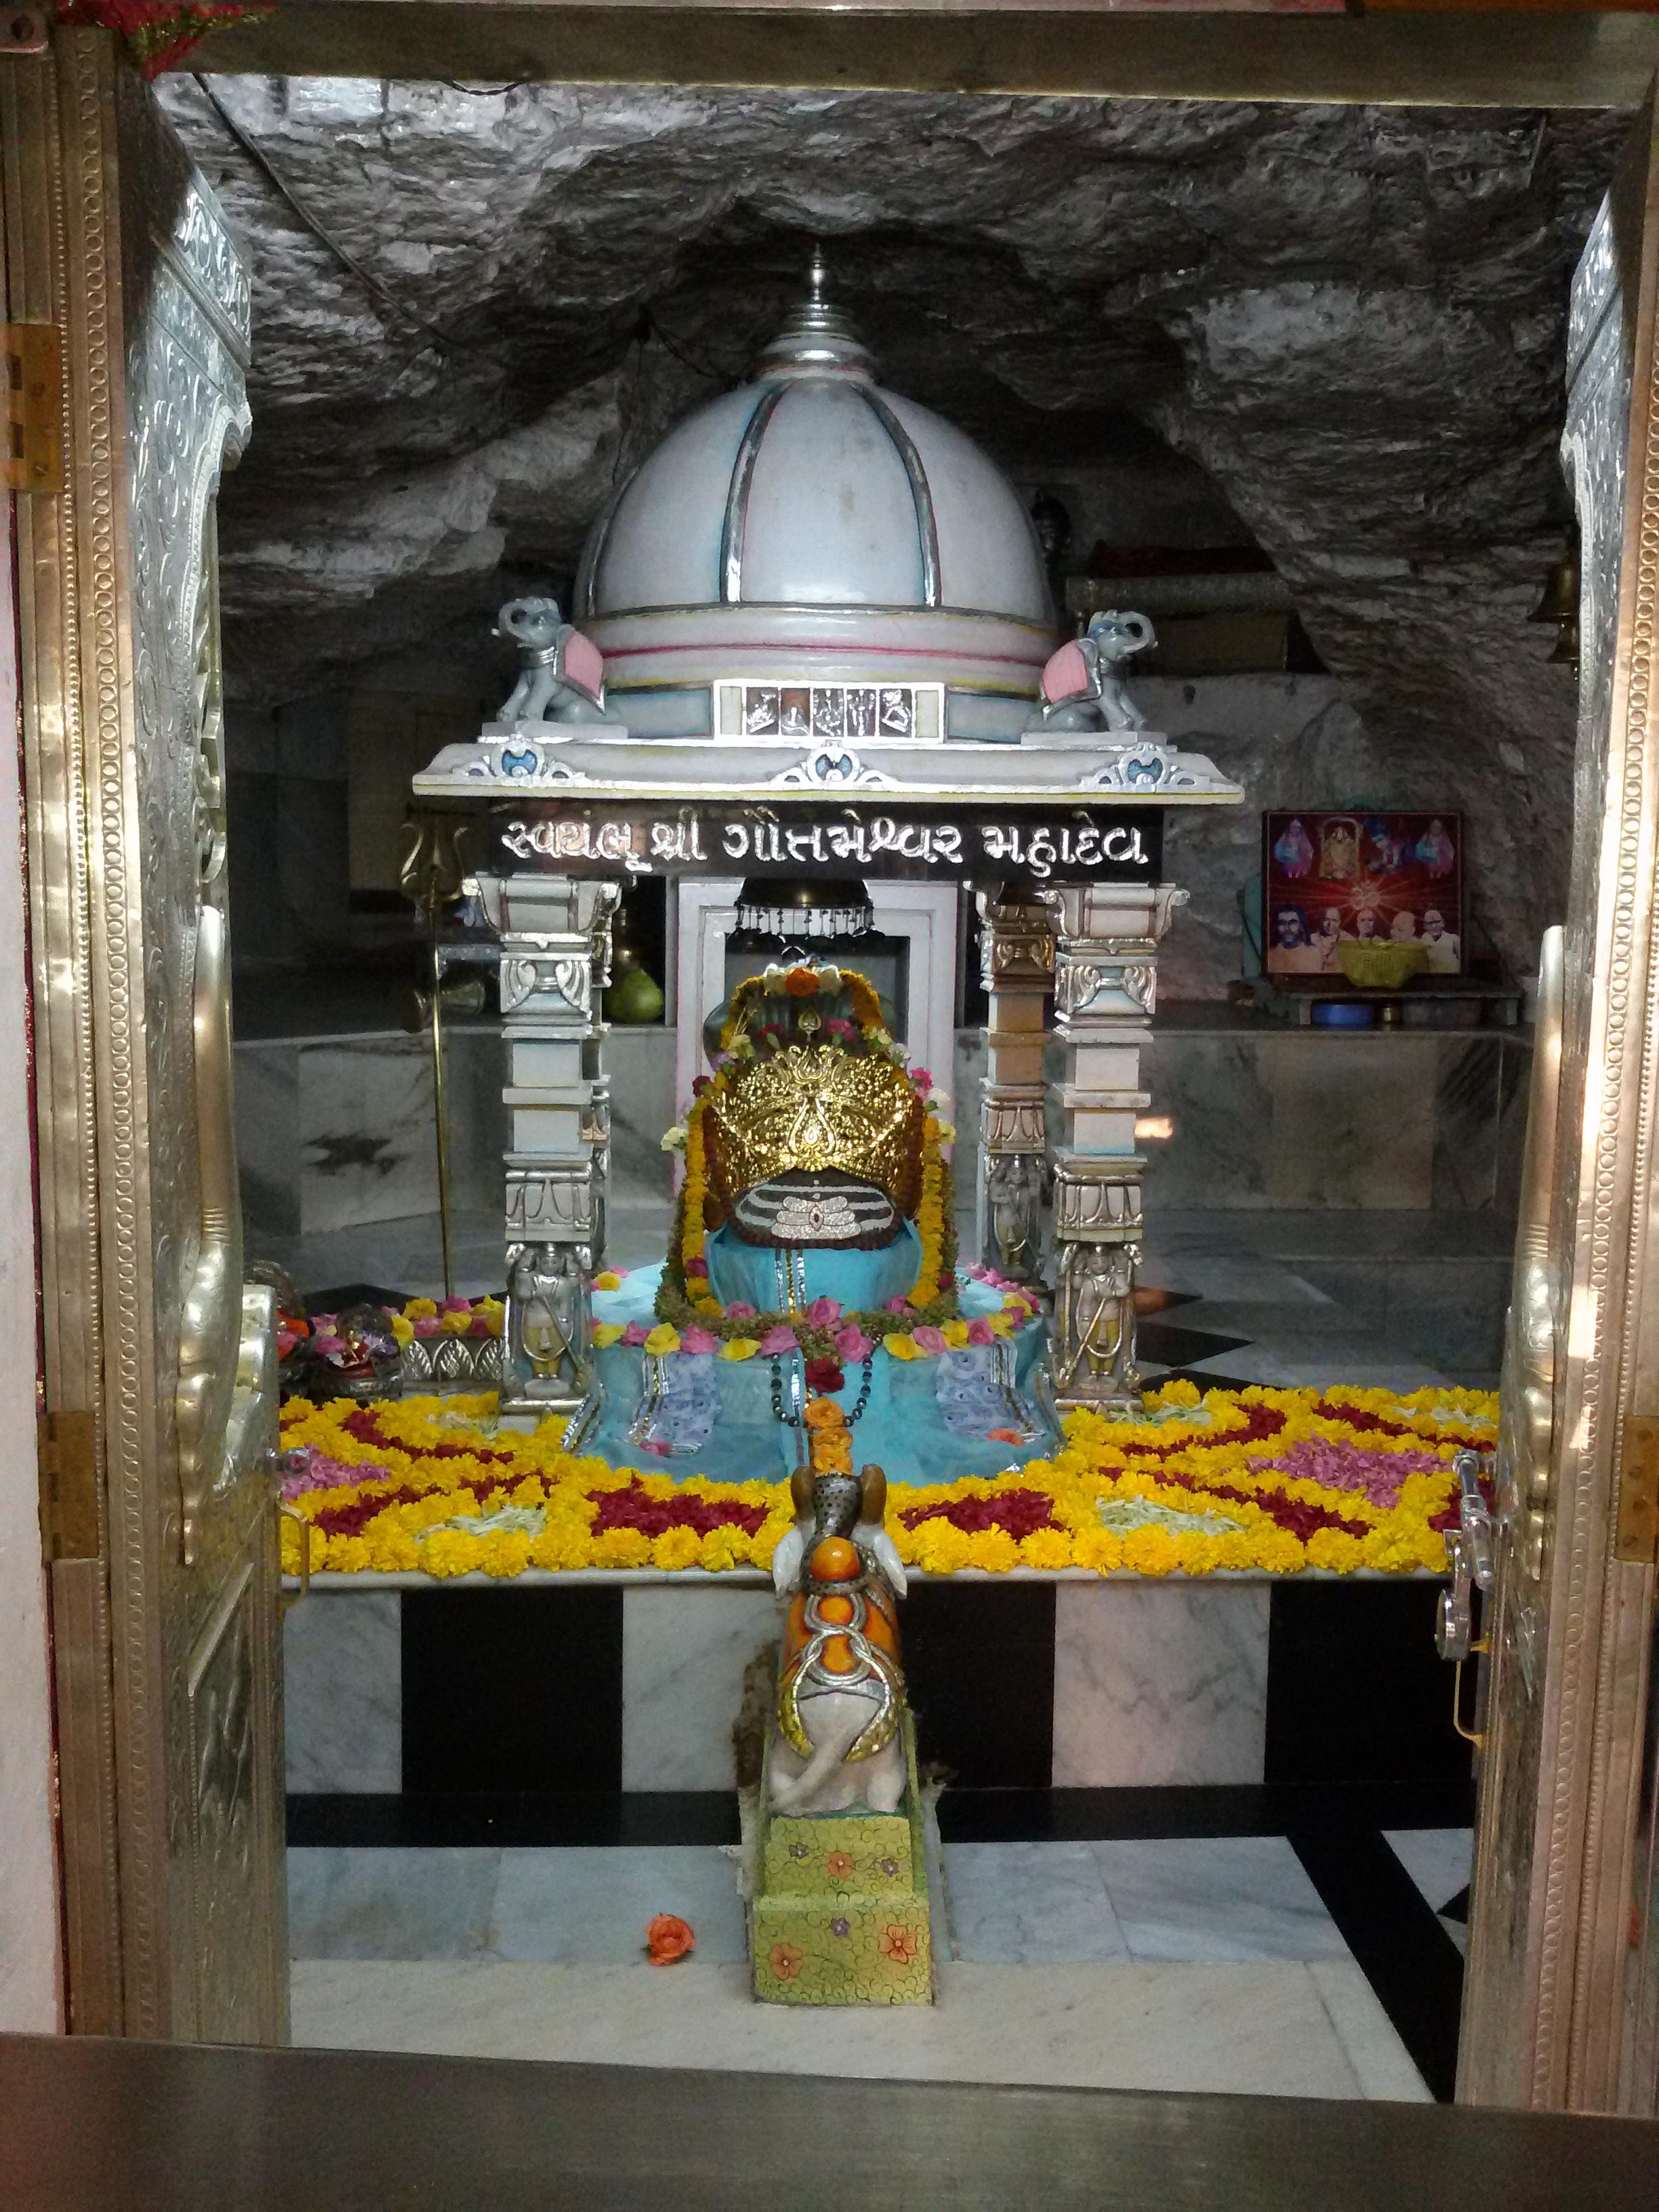 Gotmeshwar Mahadev